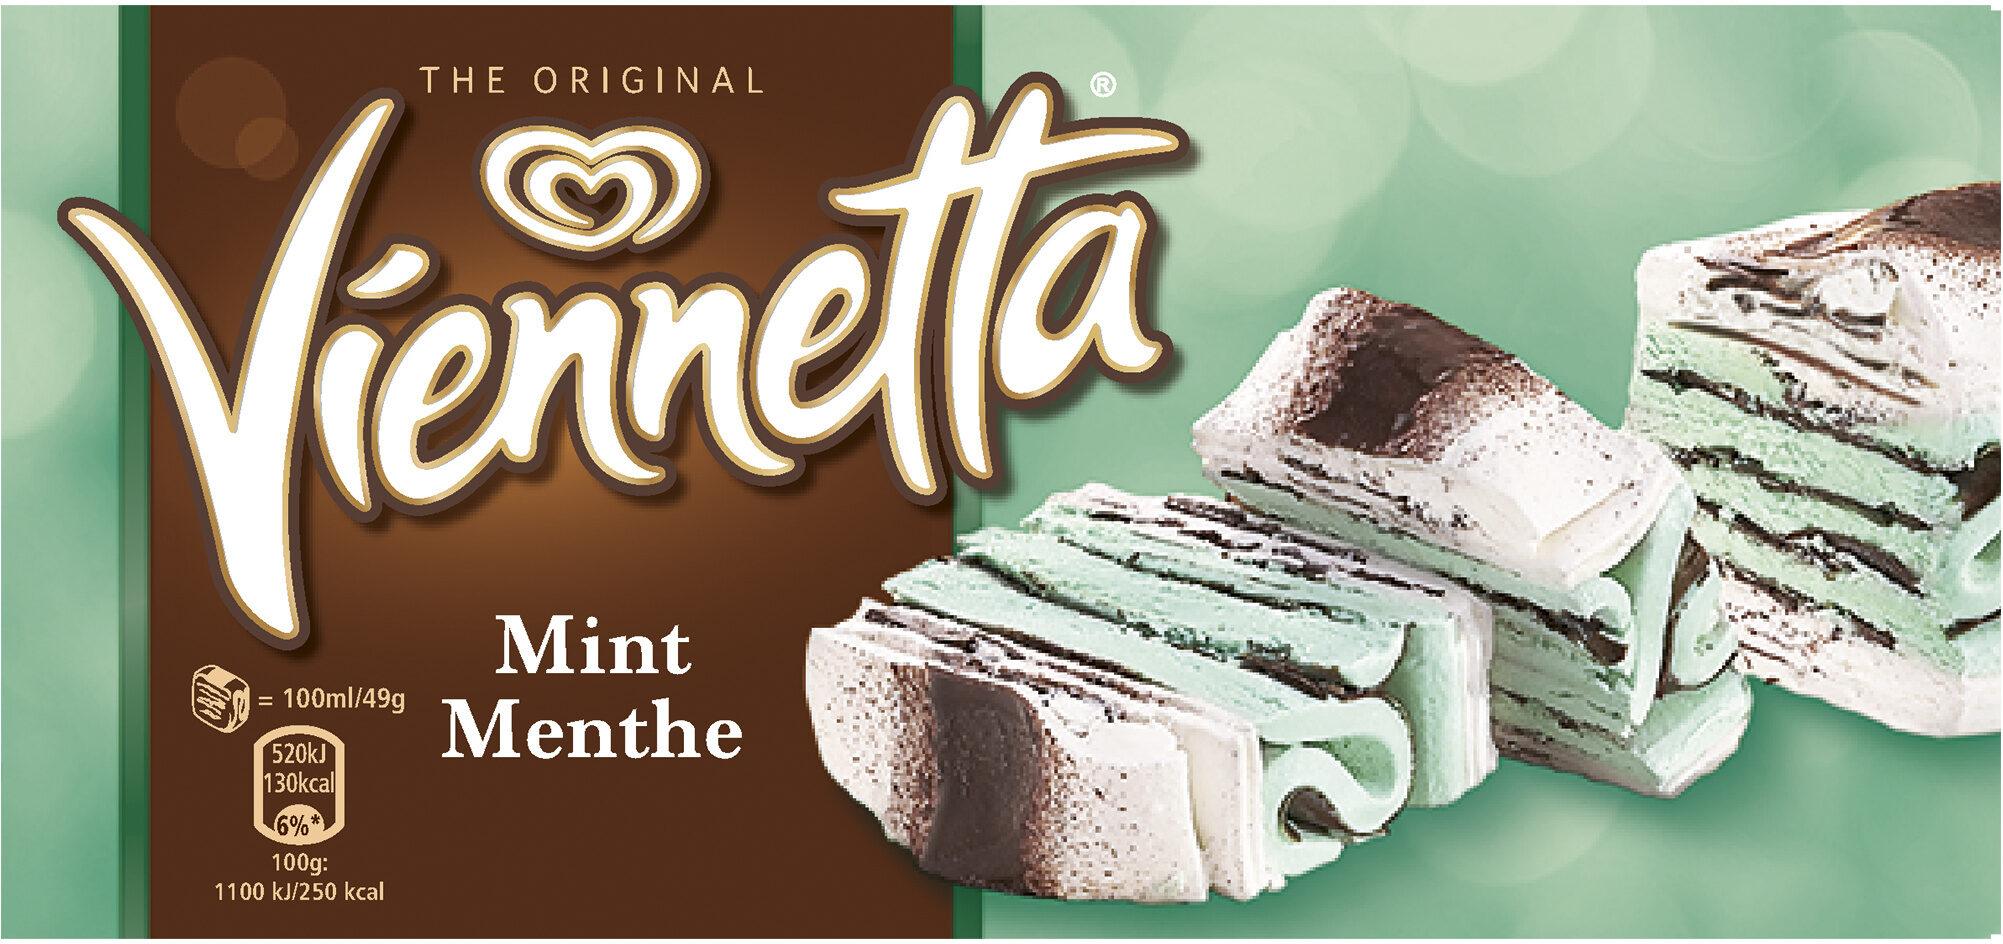 Viennetta Glace Dessert Menthe 7 parts 650ml - Product - fr